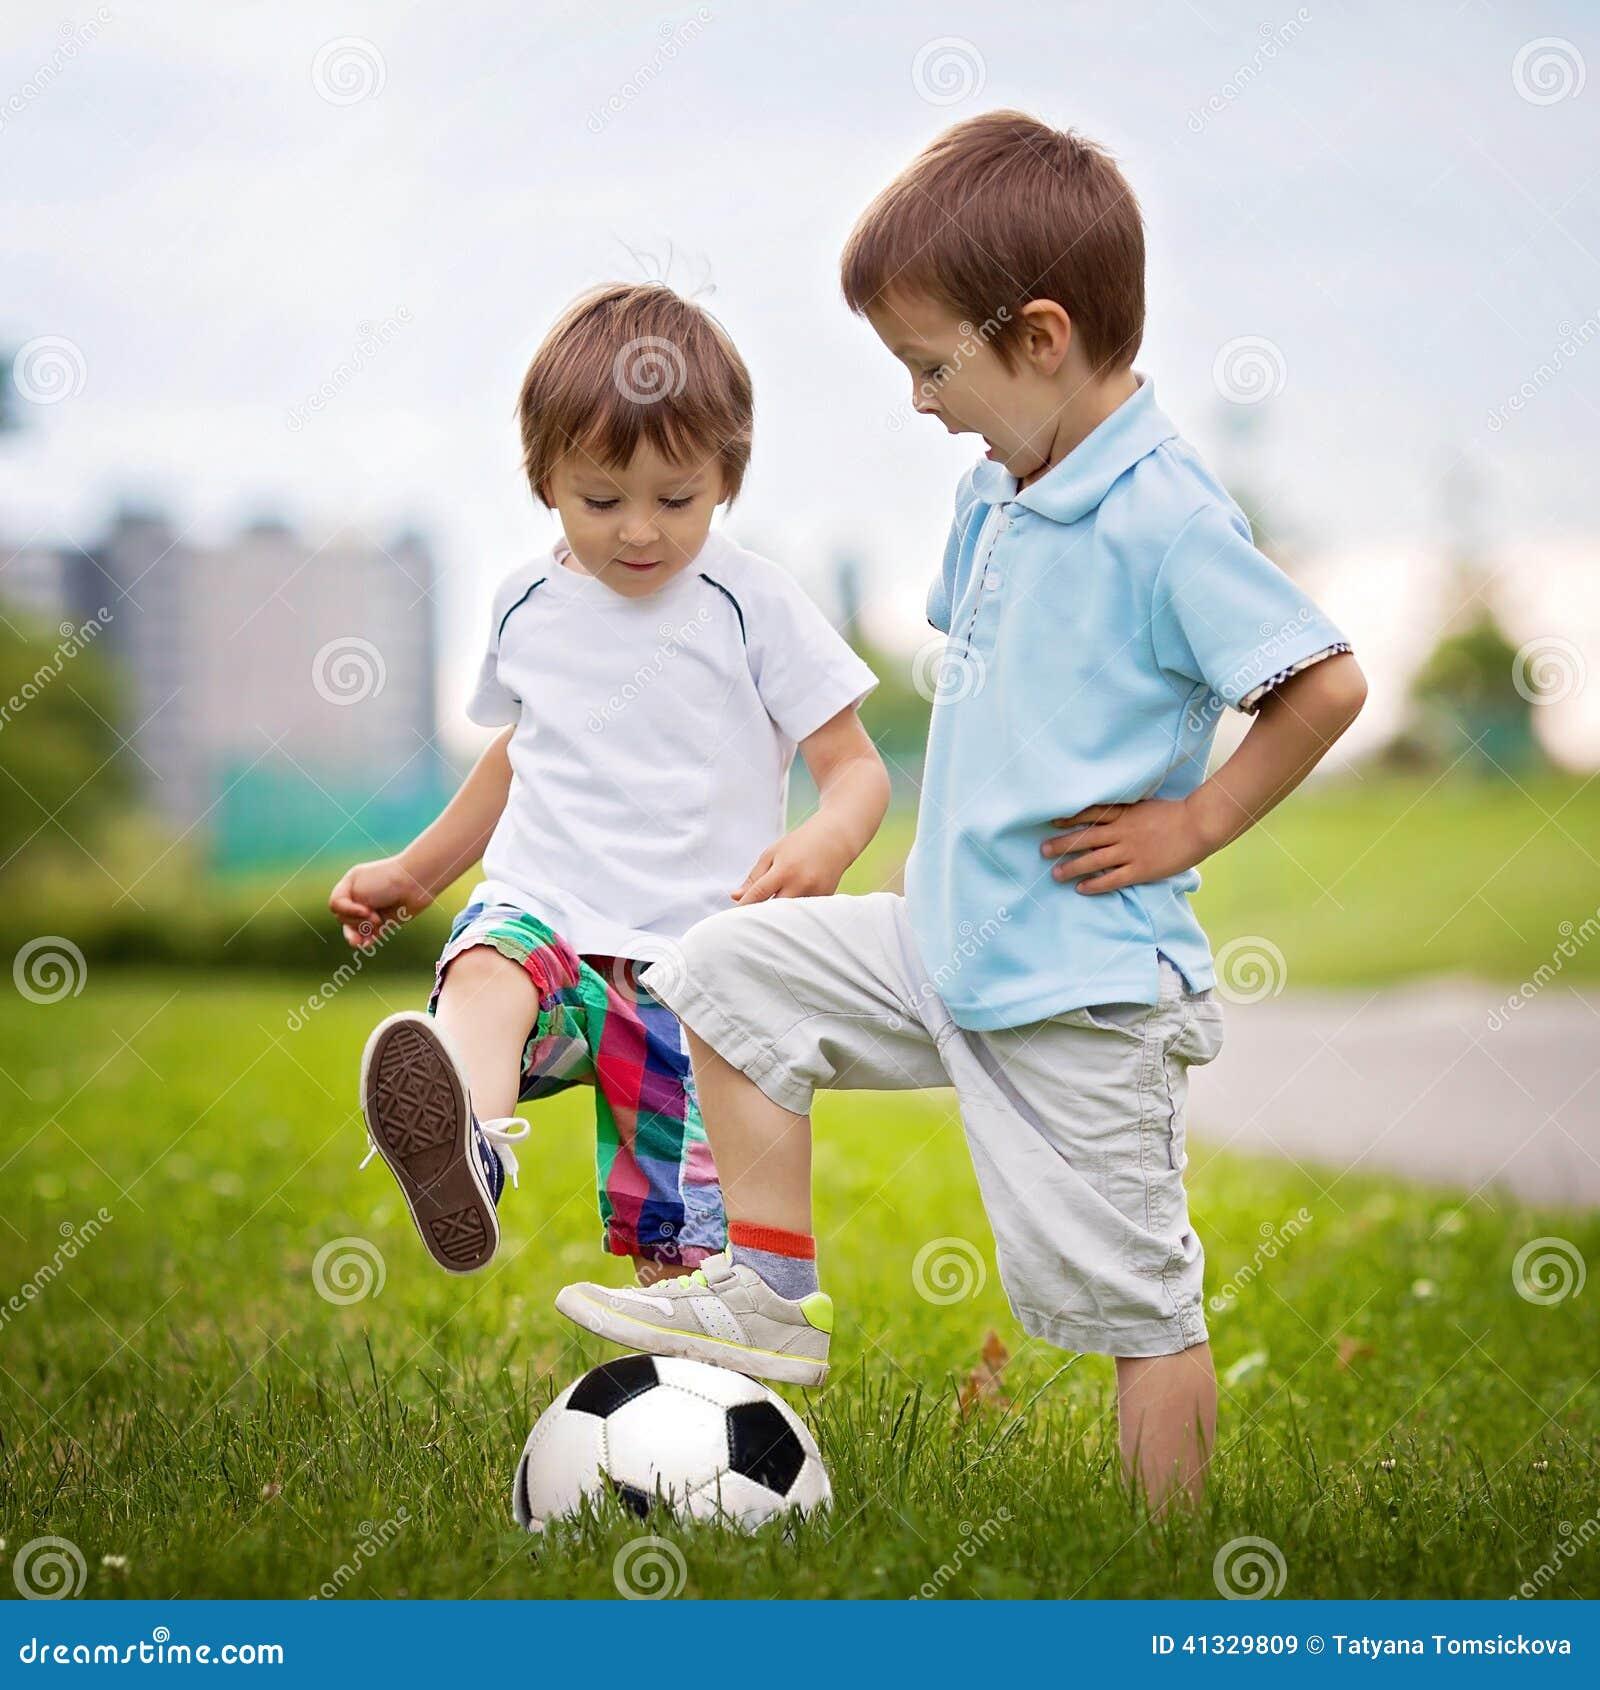 petit gar on deux jouant le football image stock image du football chaussettes 41329809. Black Bedroom Furniture Sets. Home Design Ideas